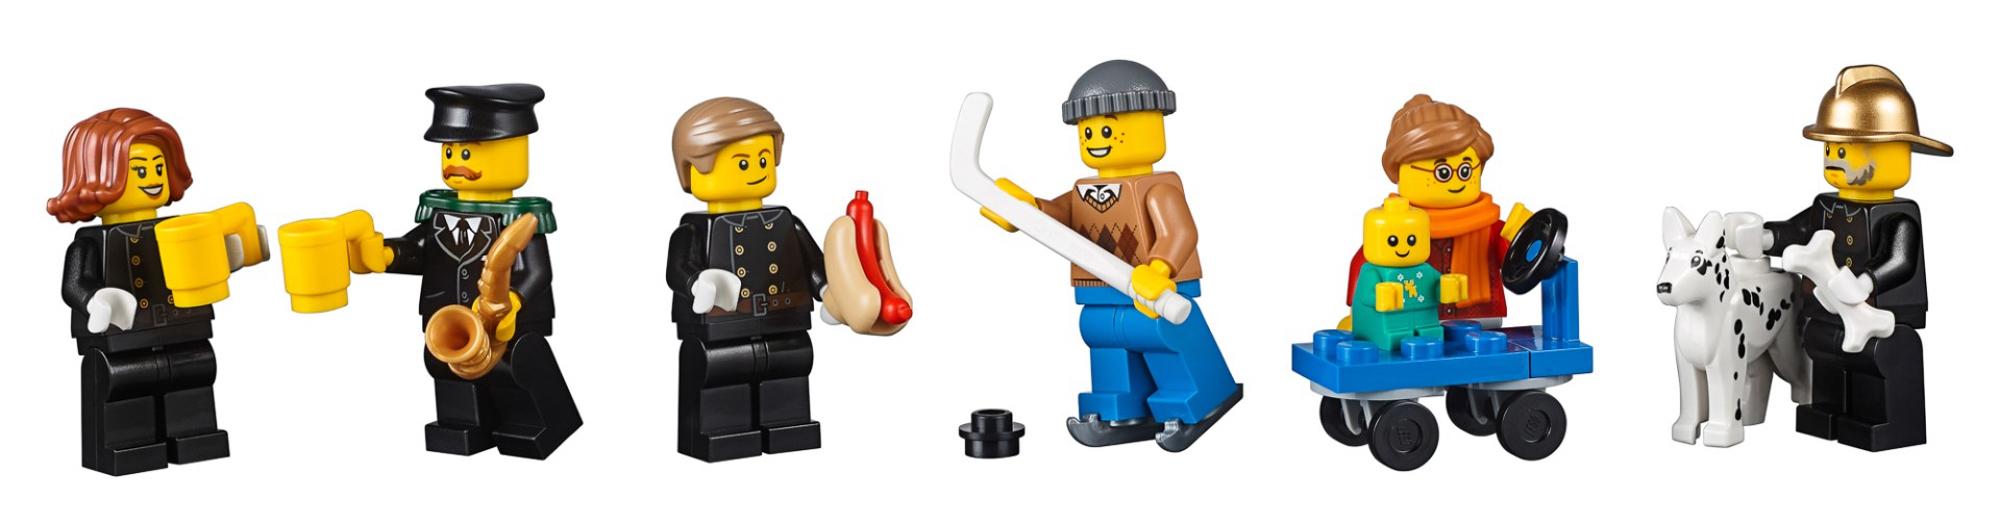 Black Minifig Shovel Fire Man Fighter Garden Spade Accessory Lego Parts